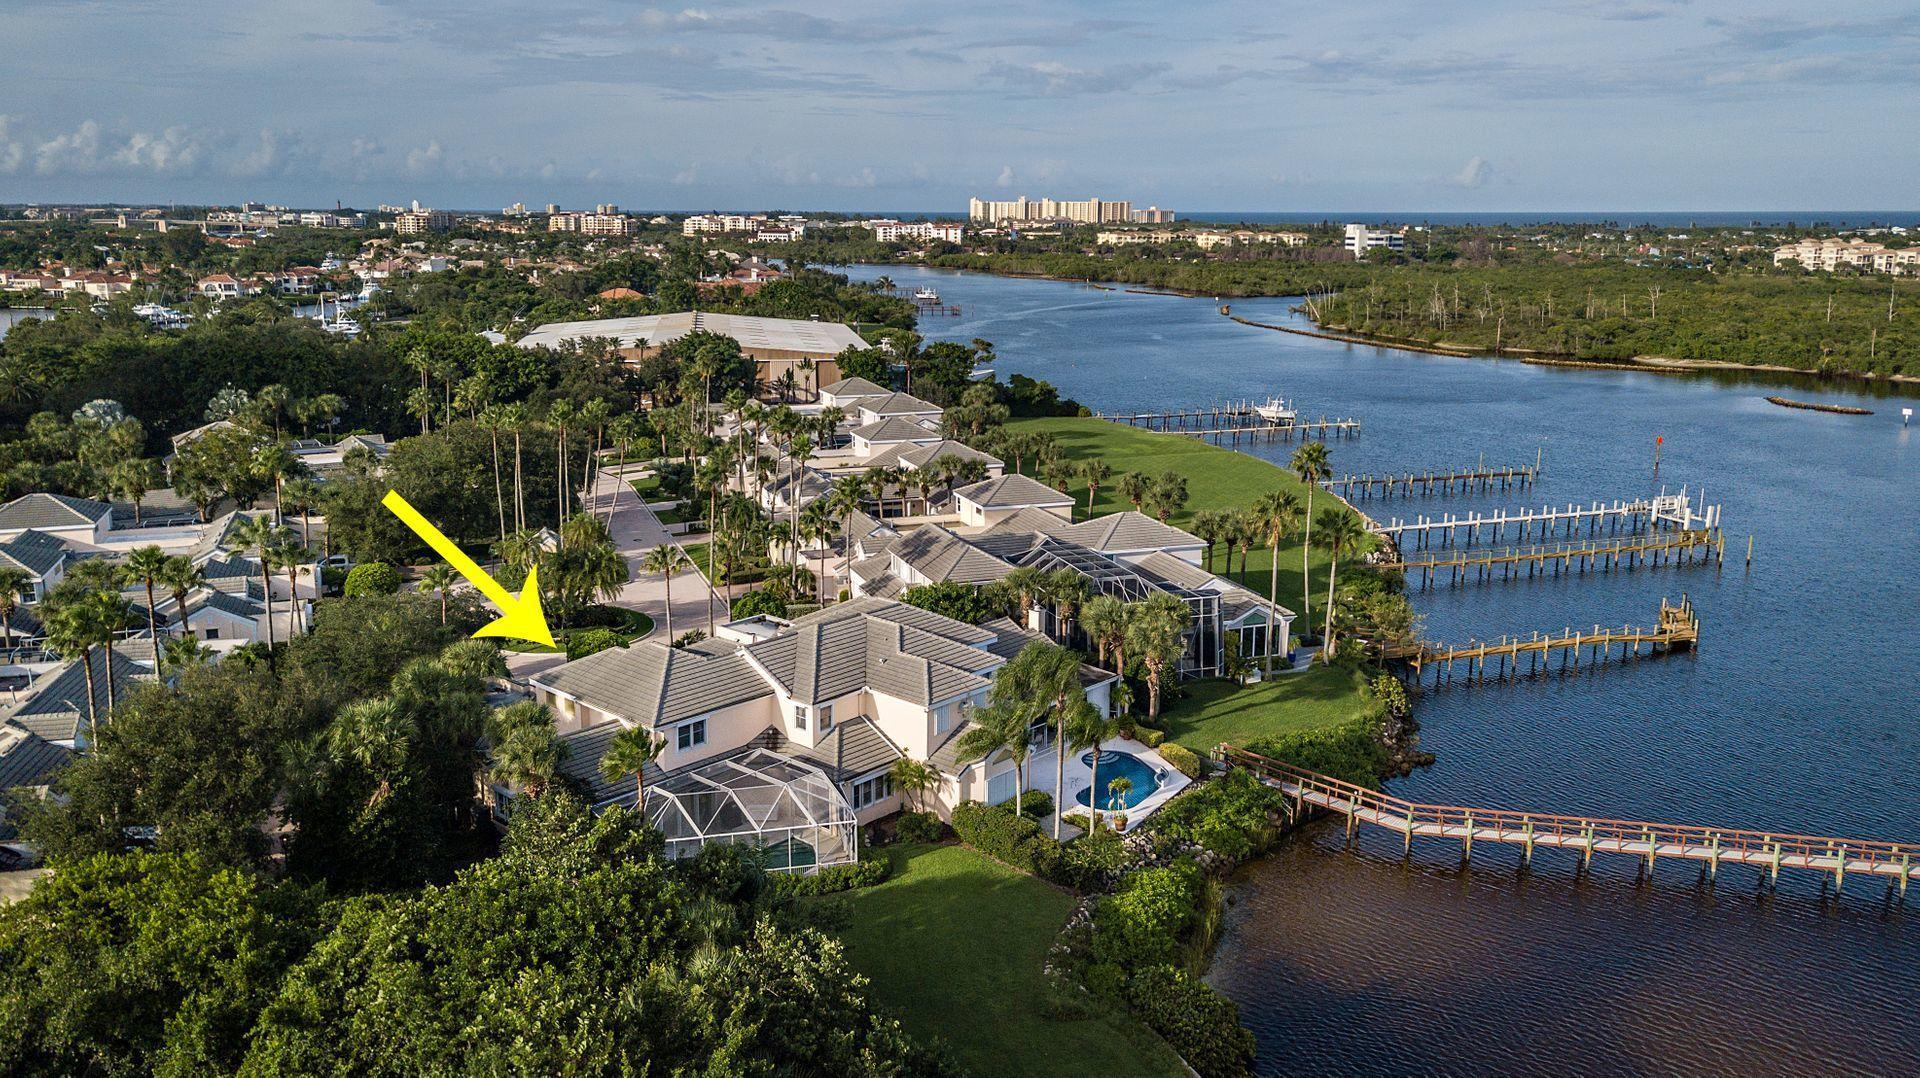 16290 Port Dickinson Drive, Jupiter, Florida 33477, 4 Bedrooms Bedrooms, ,4.1 BathroomsBathrooms,A,Townhouse,Port Dickinson,RX-10669462